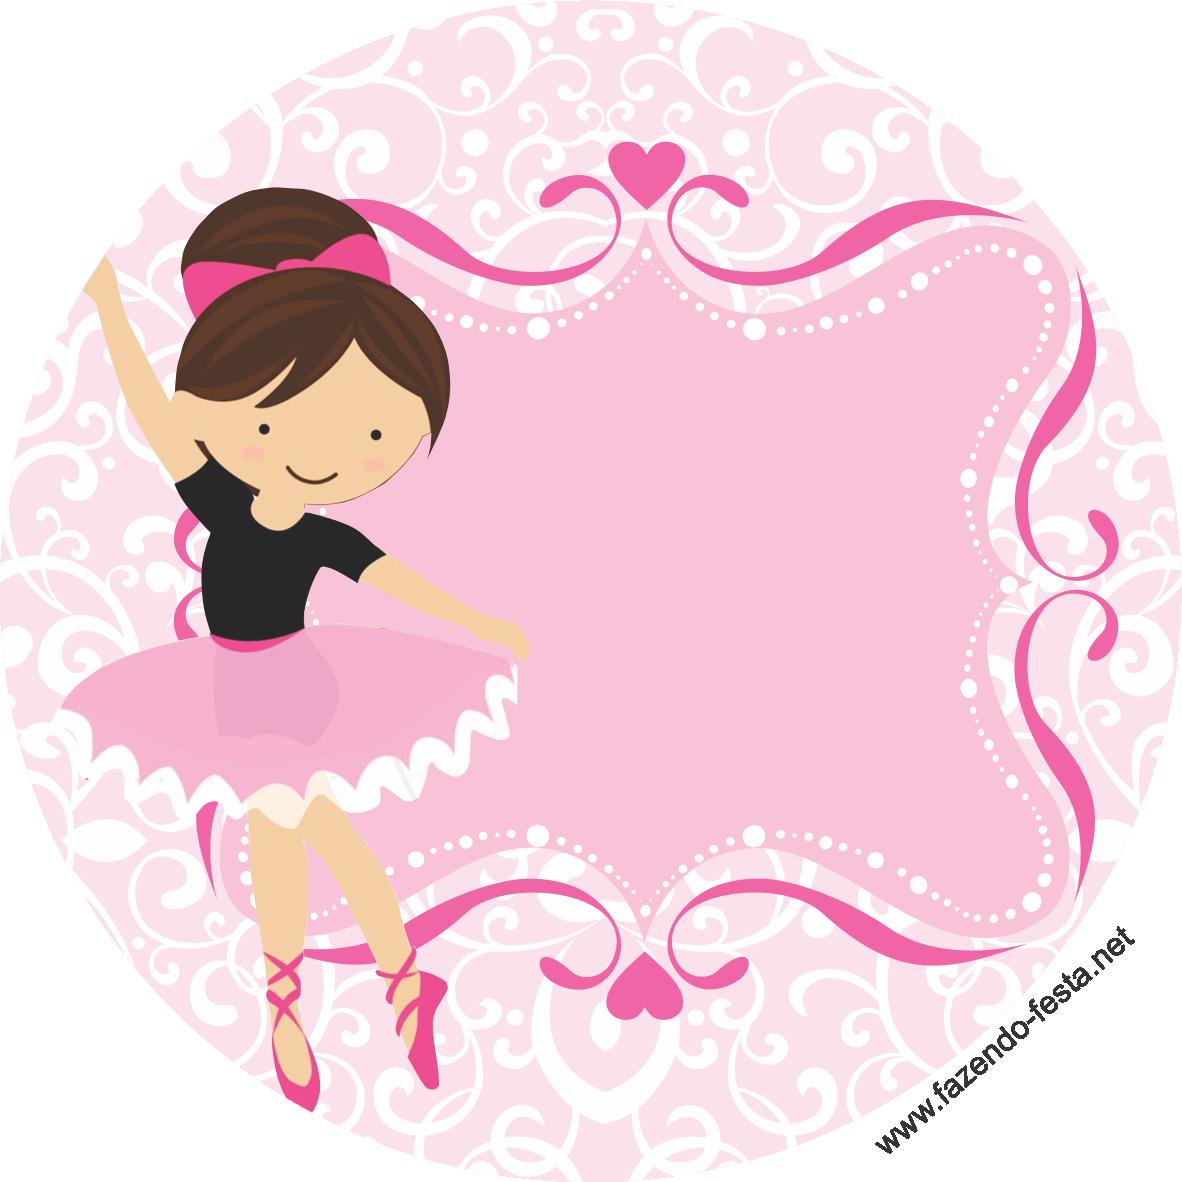 Adesivo Rivastigmina Bula ~ kit festa bailarina adesivo sacolinha Arte em Impress u00e3o Pinterest Festa bailarina